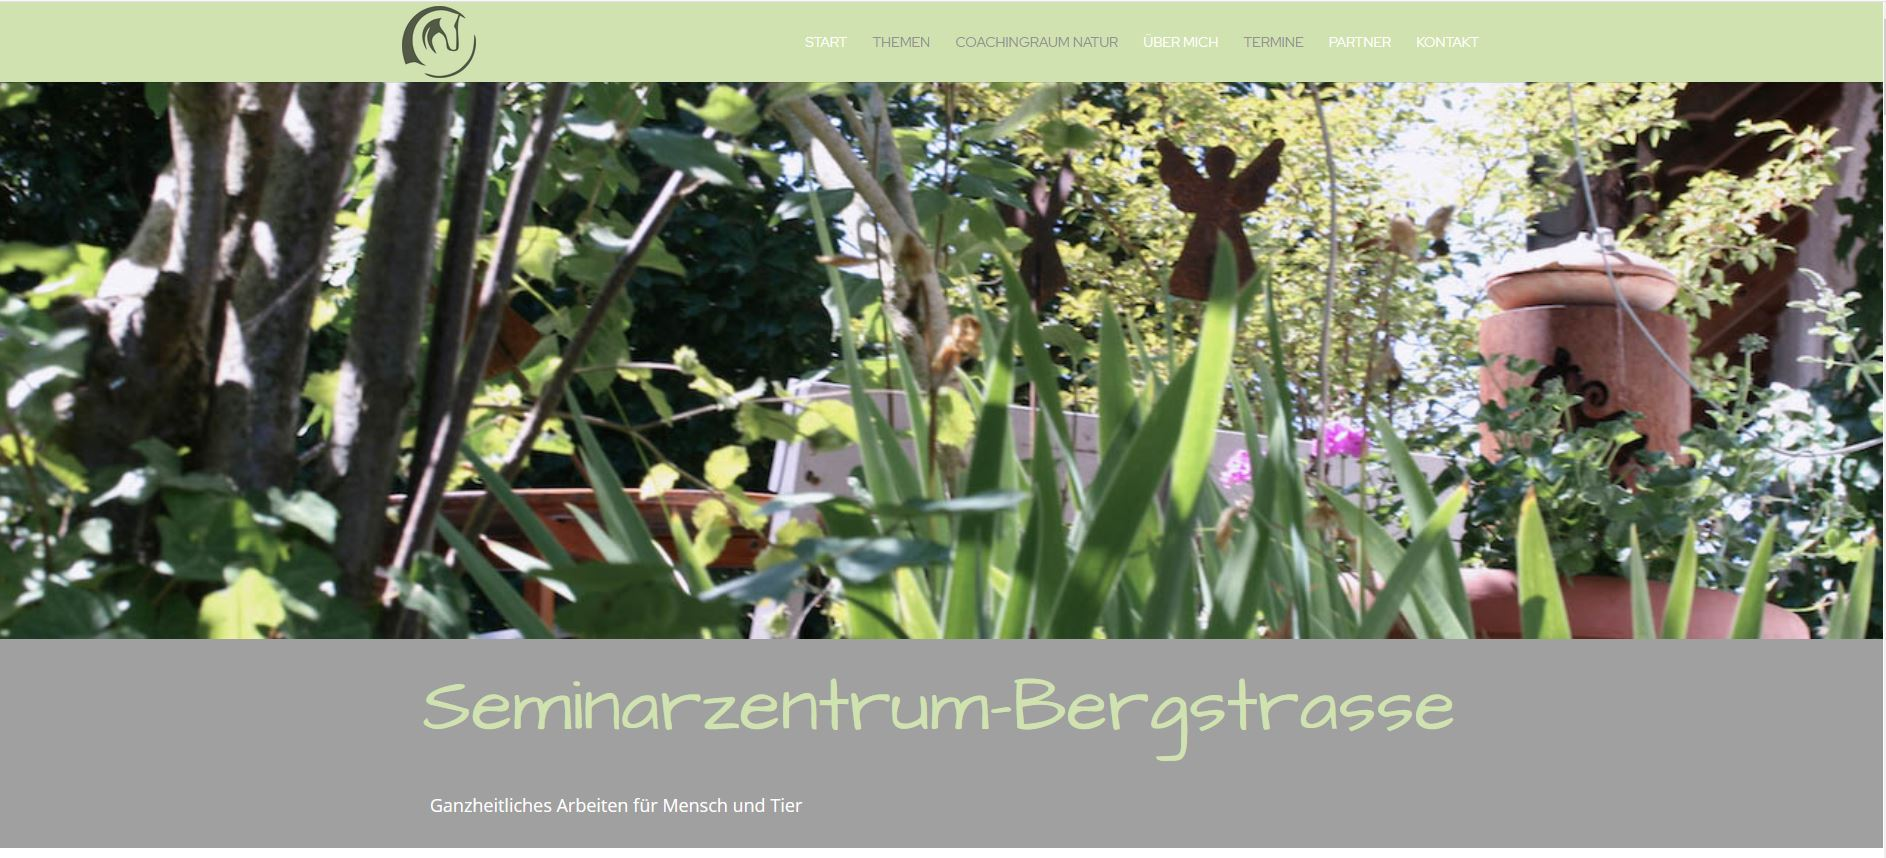 Seminarzentrum-Bergstrasse Webdesign WordPress Divi Theme